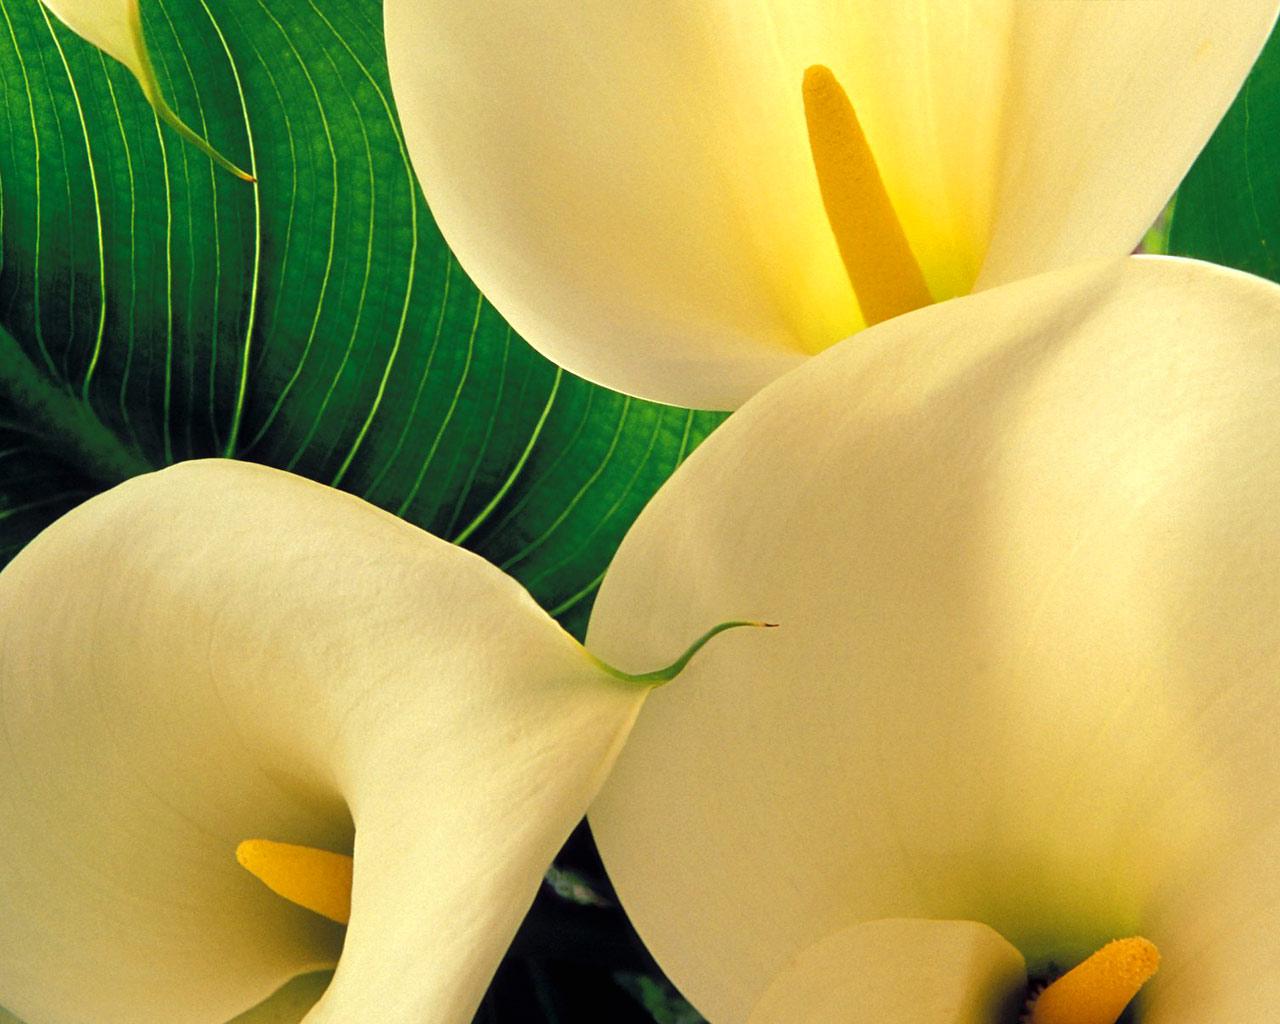 http://2.bp.blogspot.com/-N1wYHyk_AZA/TePe-_SNo-I/AAAAAAAAAC4/8LdhKshagH4/s1600/Yellow%20Calla%20Lilies-Flowers-Wallpapers.jpg